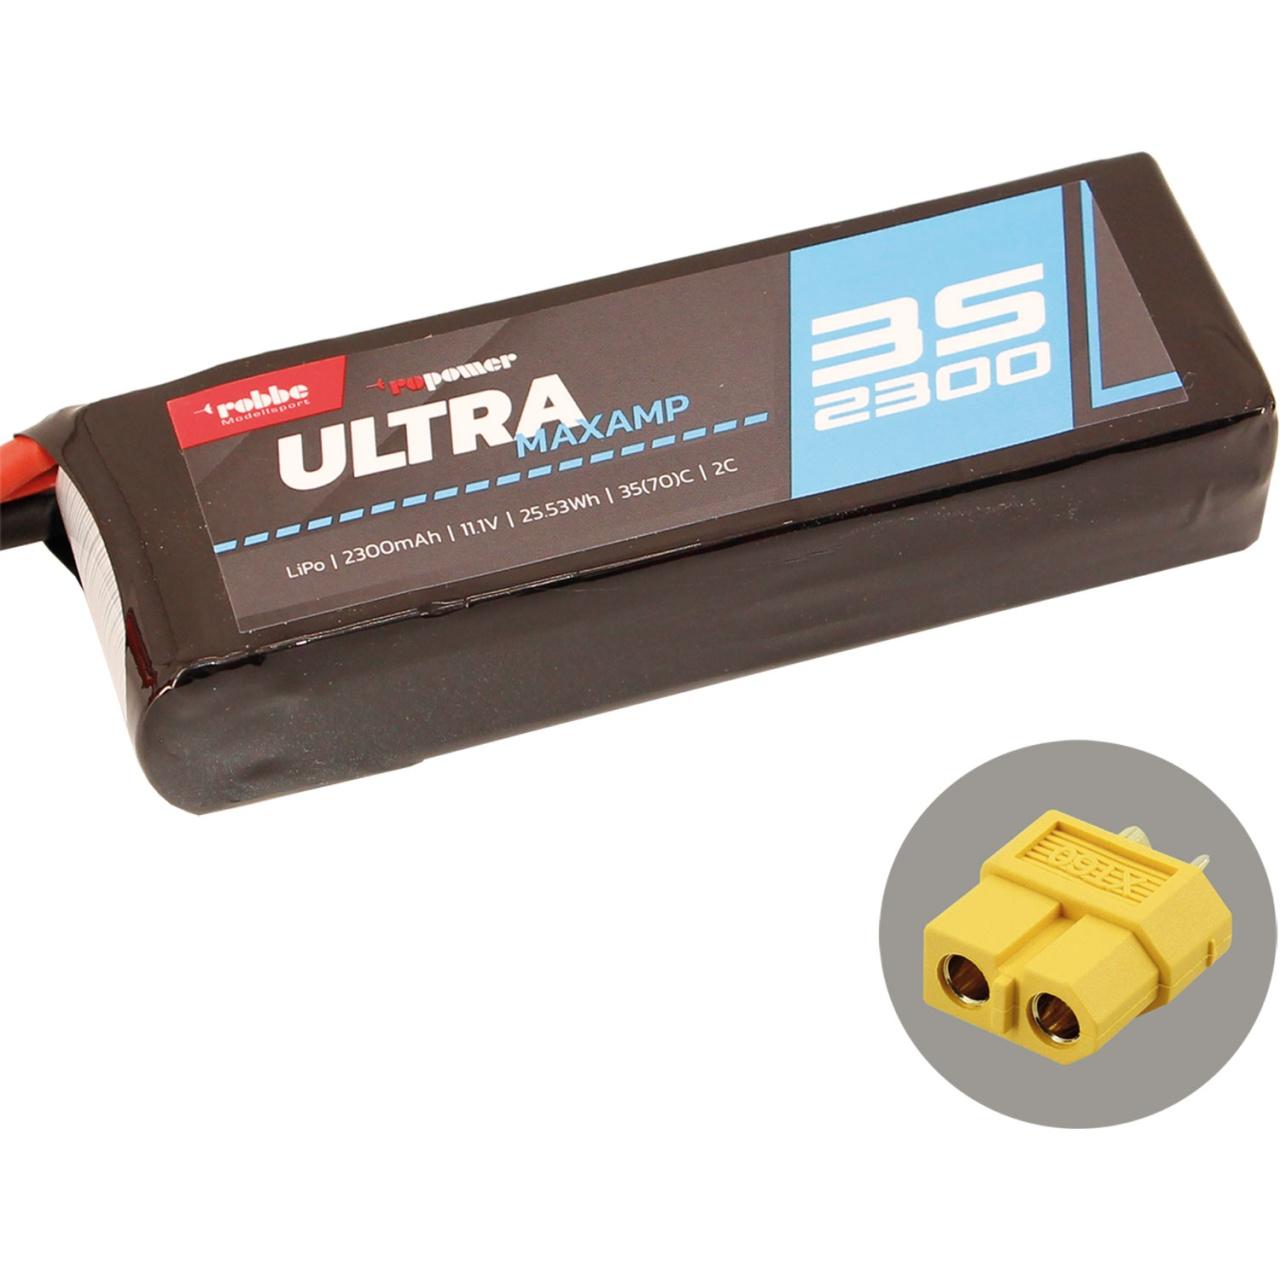 Ultra Max Amp 3S 2300mAh